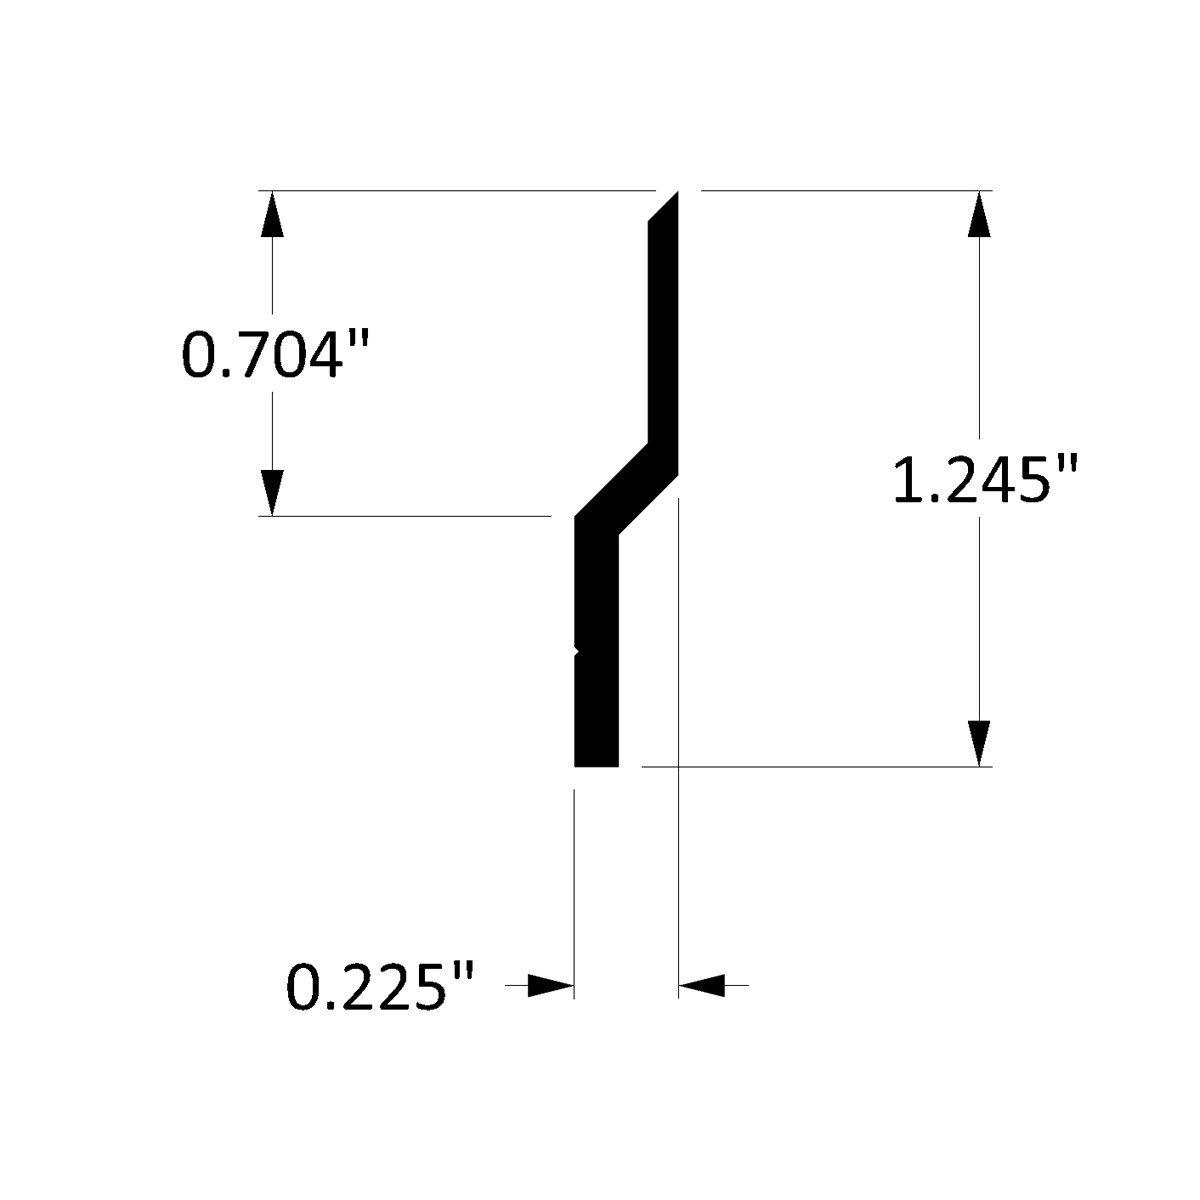 Aluminum Z-Hanger, 6ft Lengths with Holes 1'' on Center (20 Pack) by Orange Aluminum (Image #3)